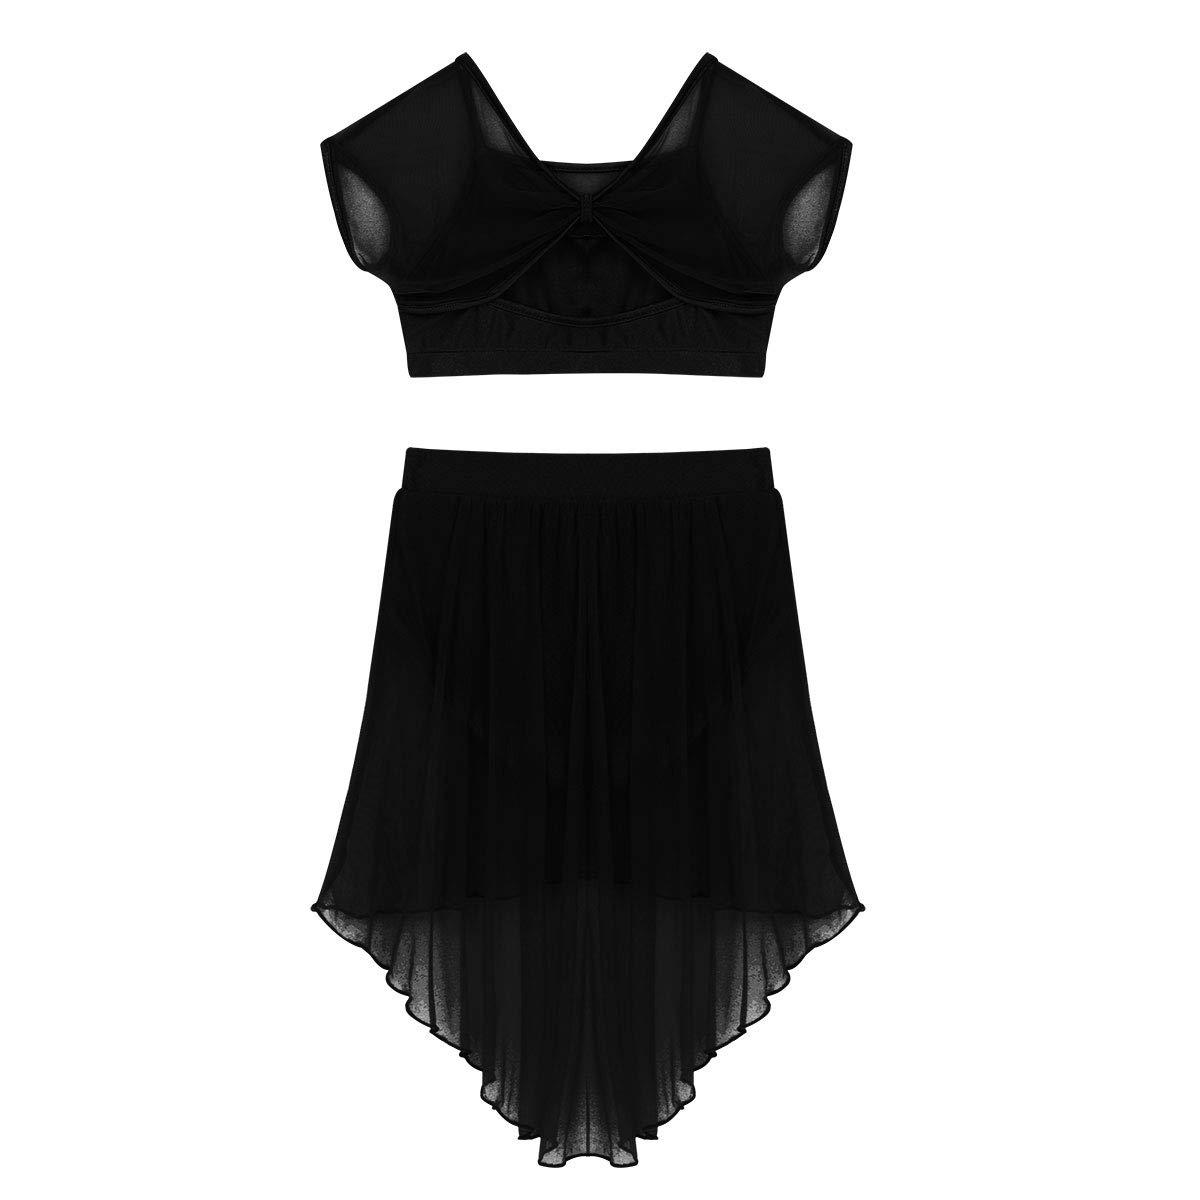 TiaoBug 2 Pieces Crop Top with Tulle Skirt Set Kids Girls Camisole Sequins Ballet Lyrical Latin Dress Dance Costume